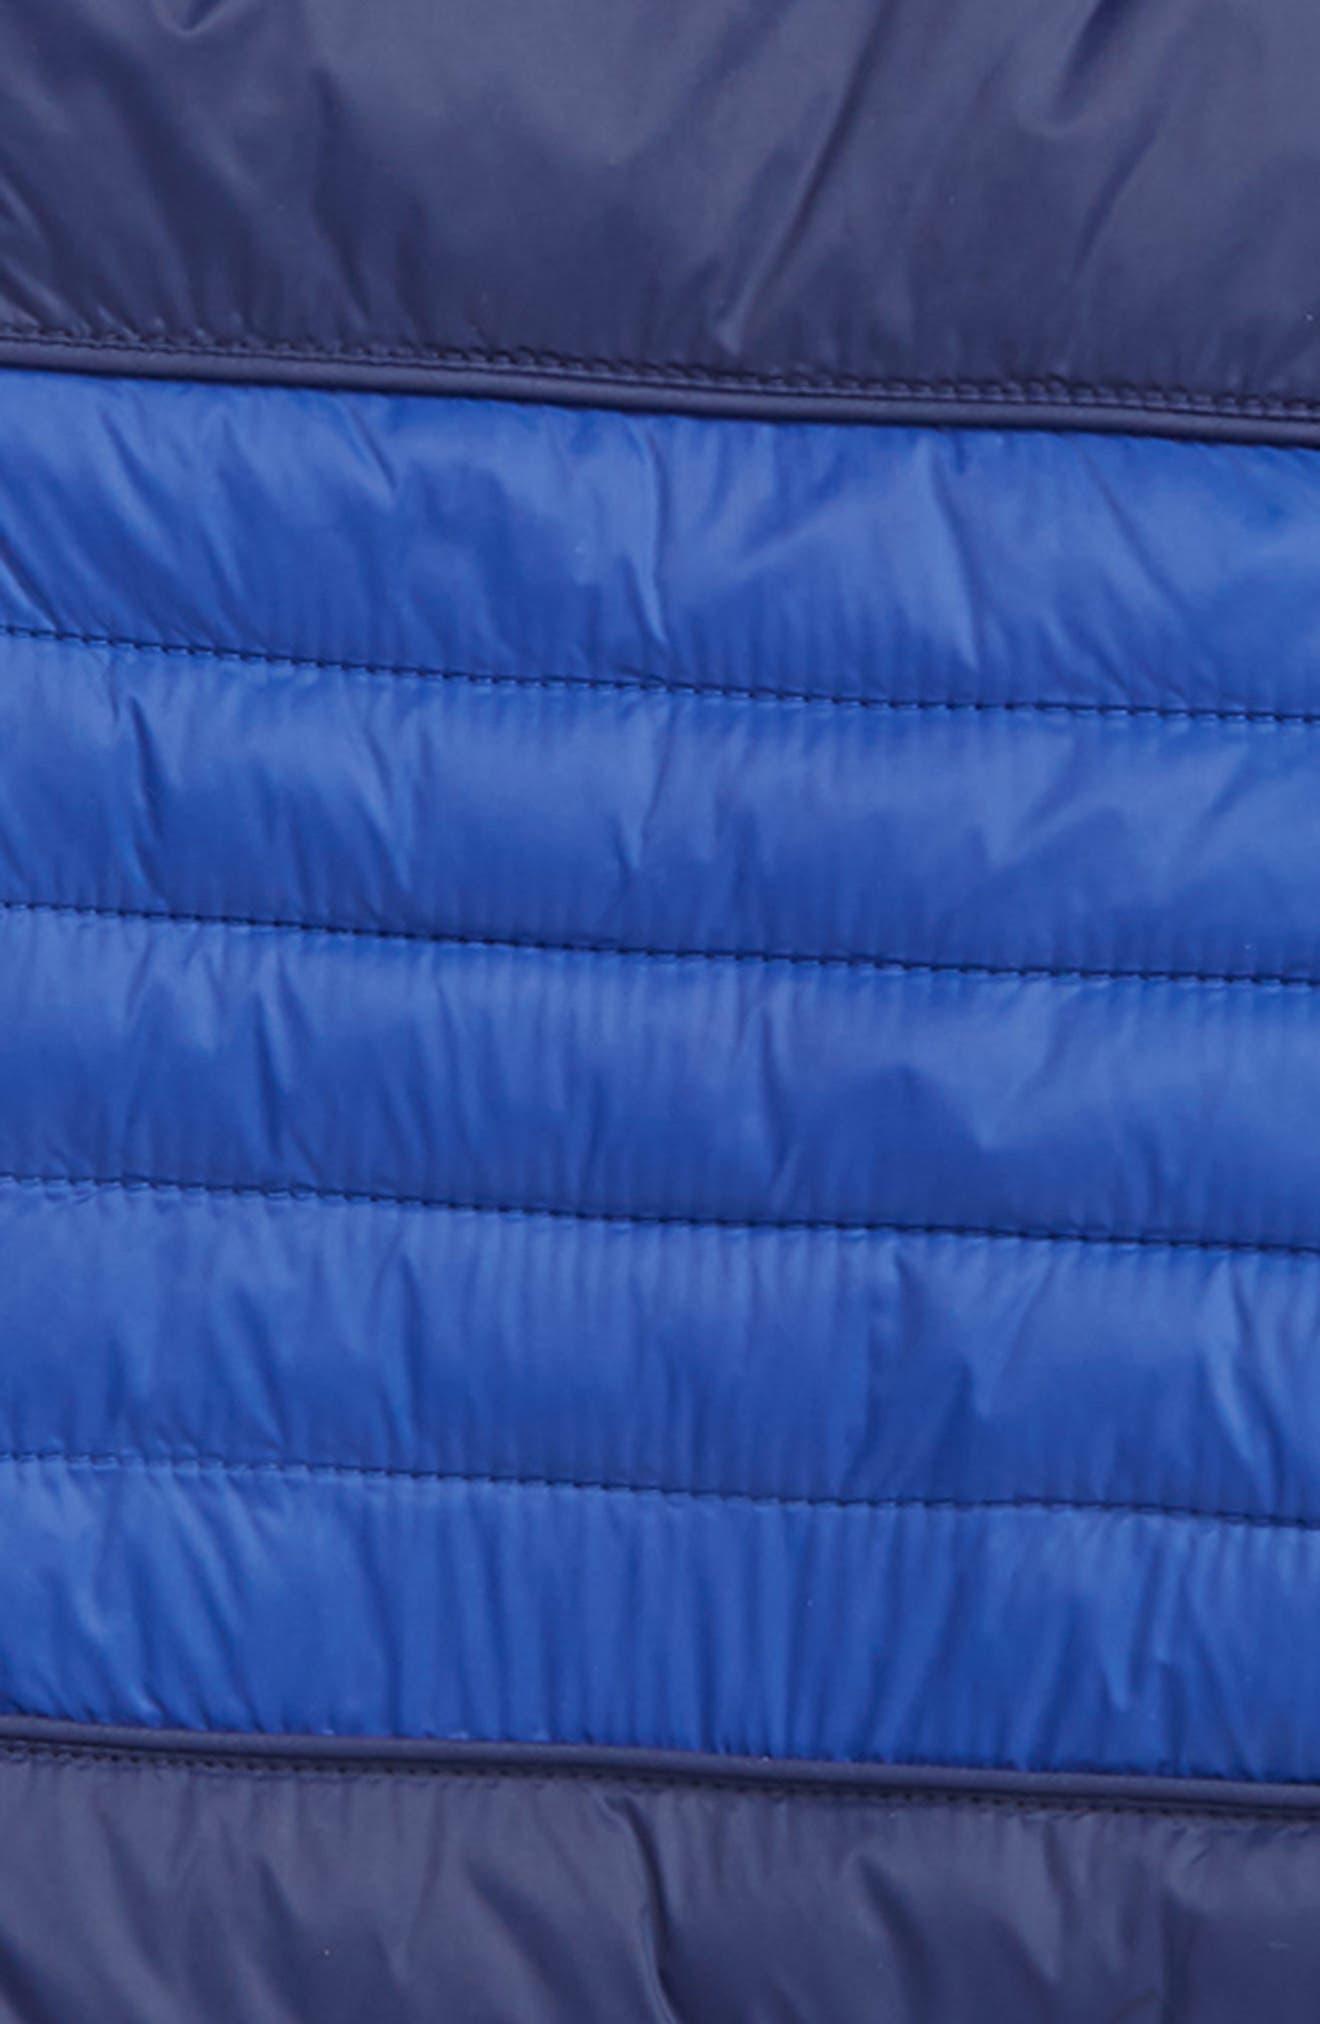 MOOSE KNUCKLES,                             Peel Quilted Hooded Jacket,                             Alternate thumbnail 2, color,                             NAVY